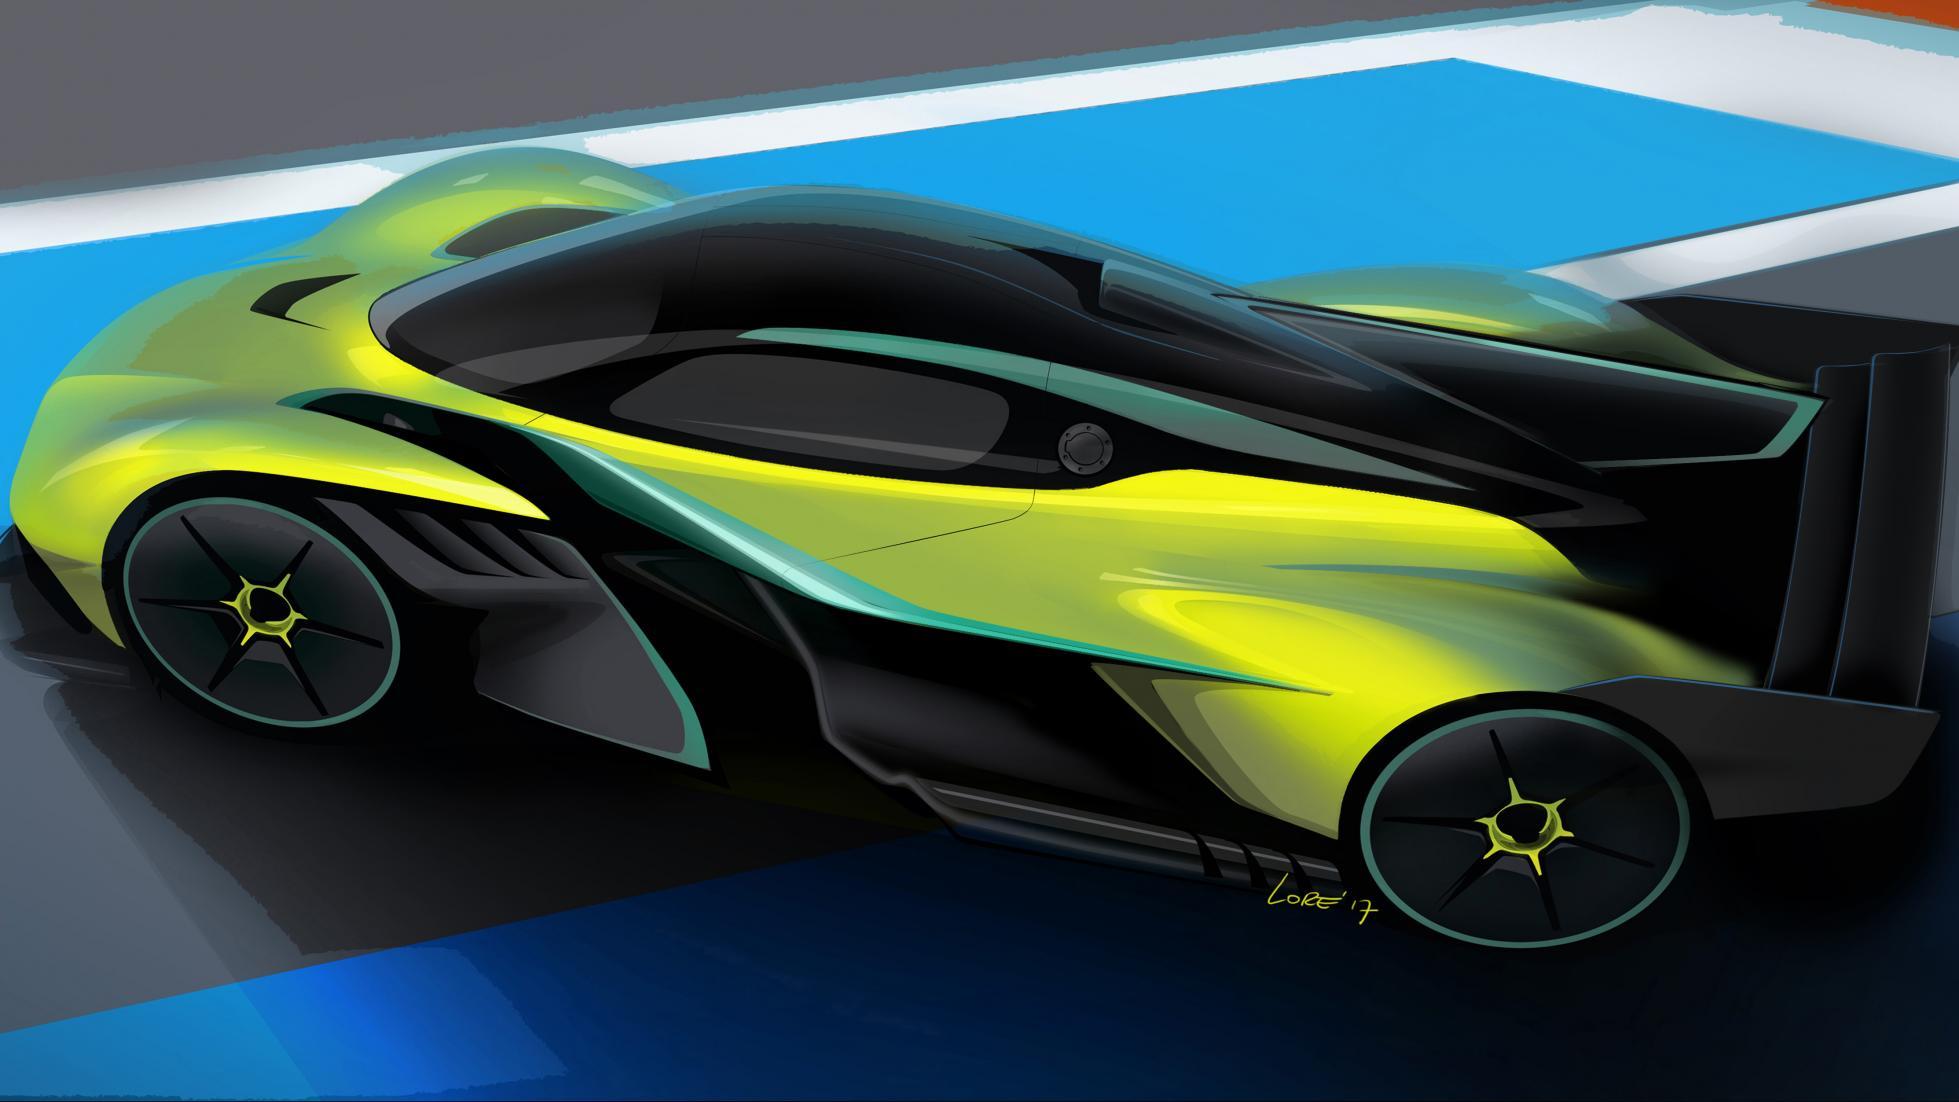 Aston Martin Valkyrie AMR Pro track auto revealed